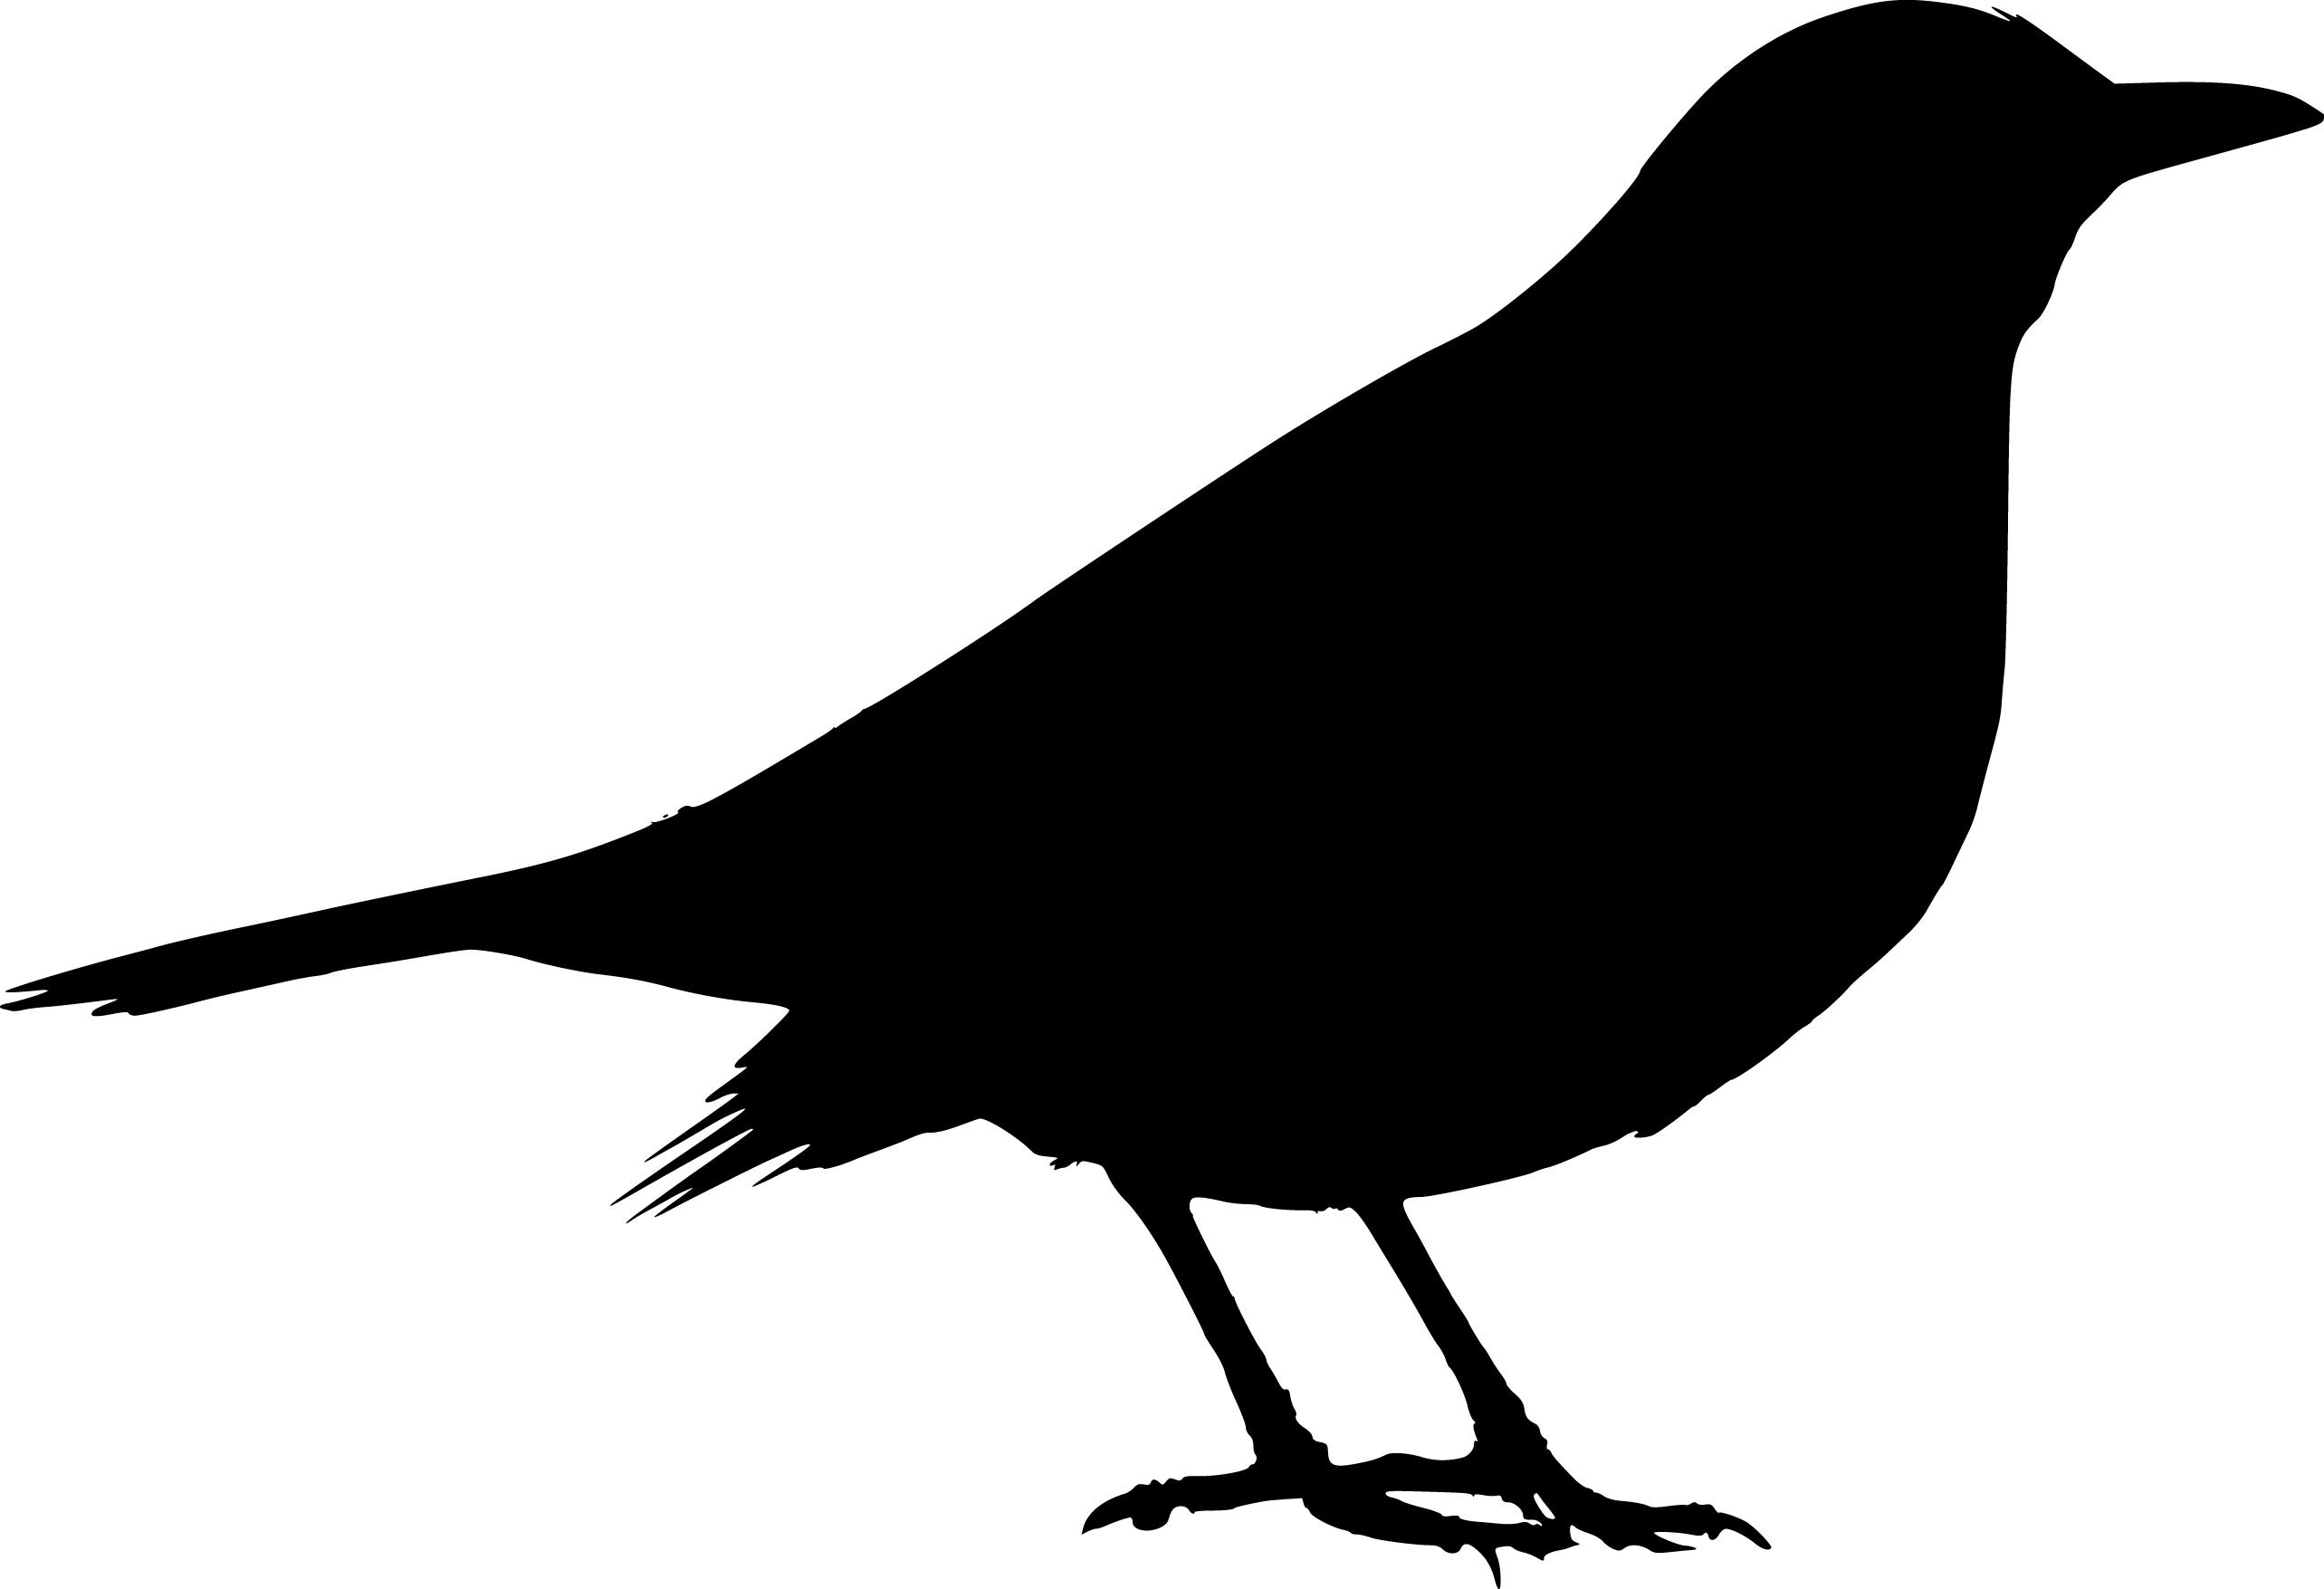 black bird silhouette clipart best